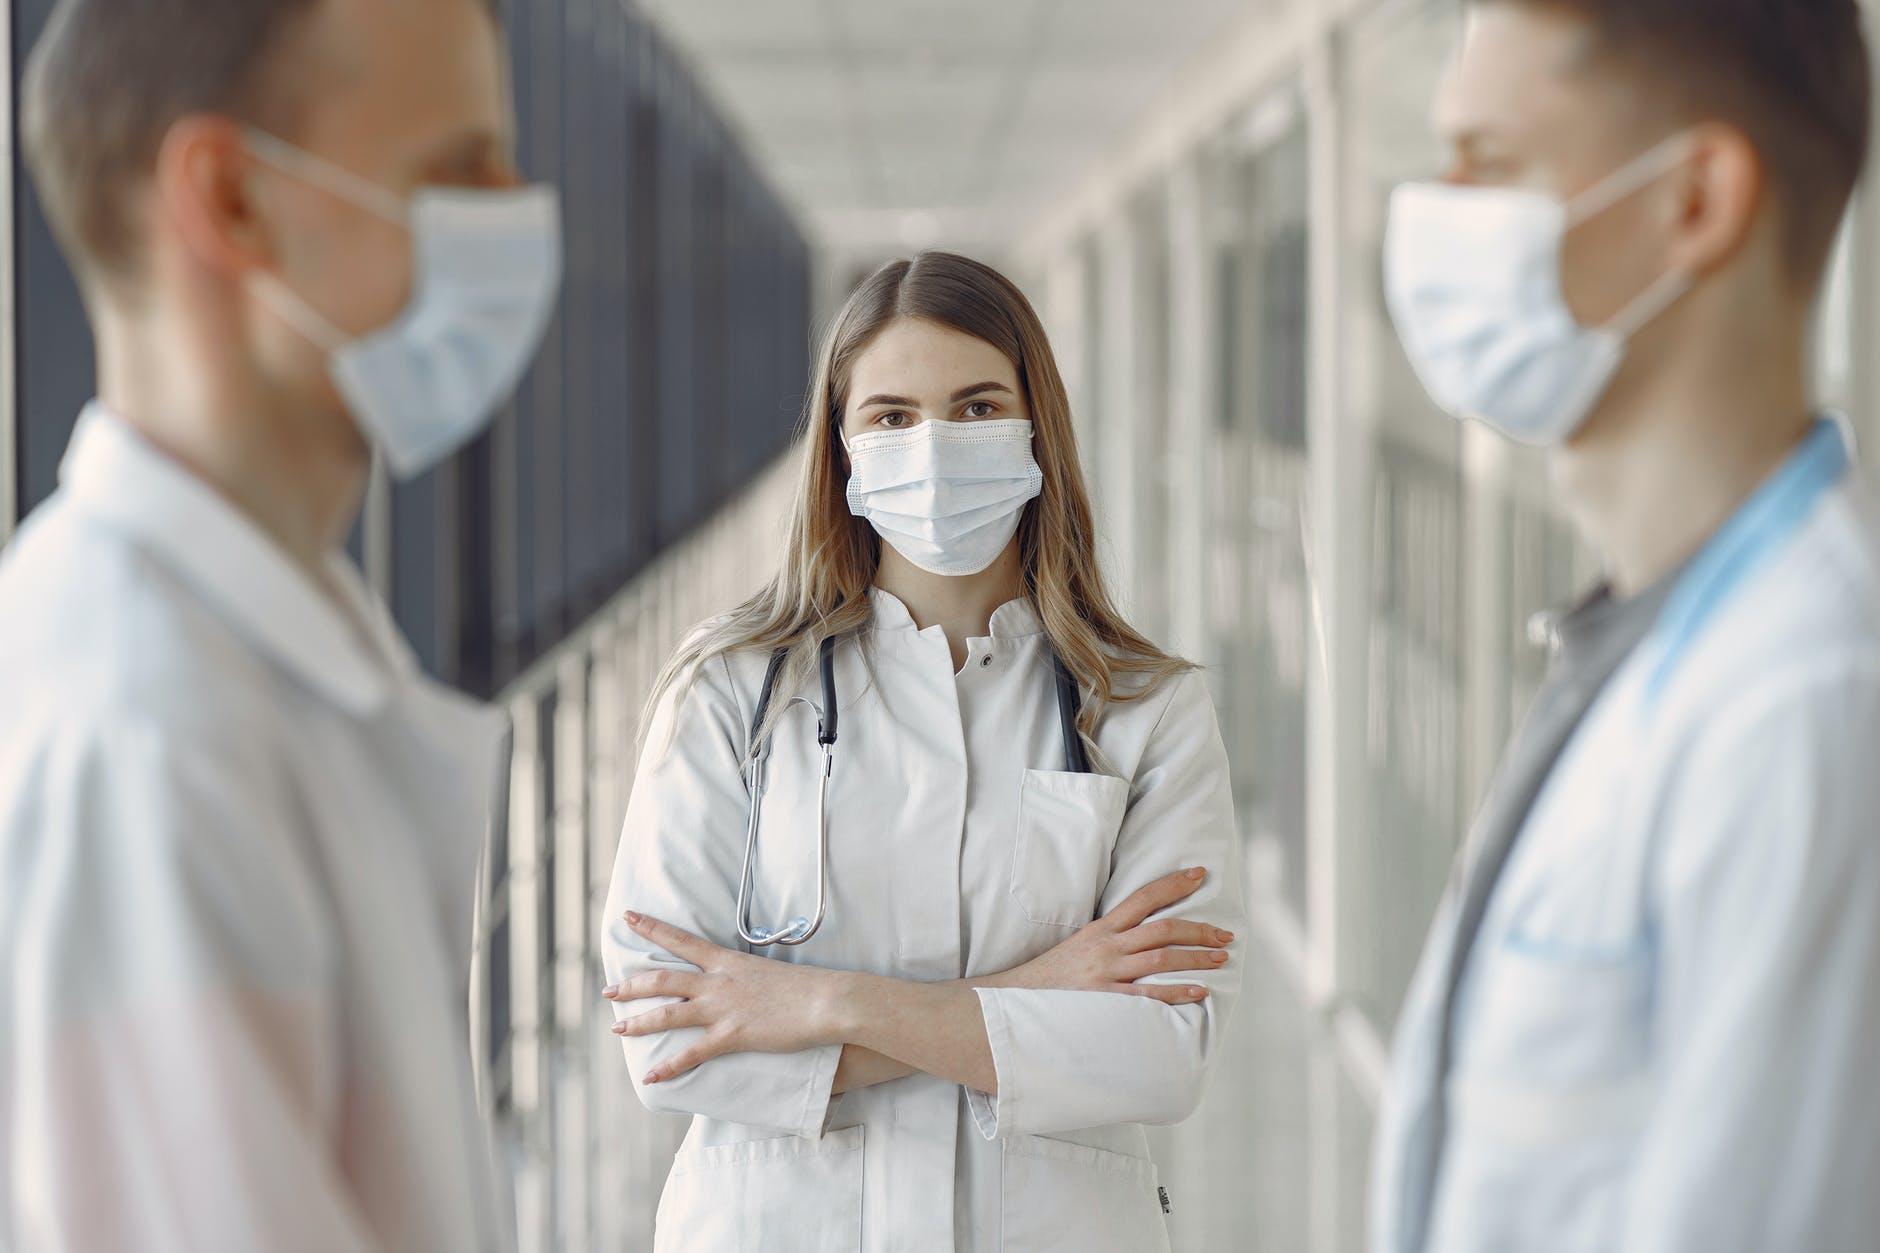 How Ninsaúde Apolo helps maintain medical confidentiality in the clinic